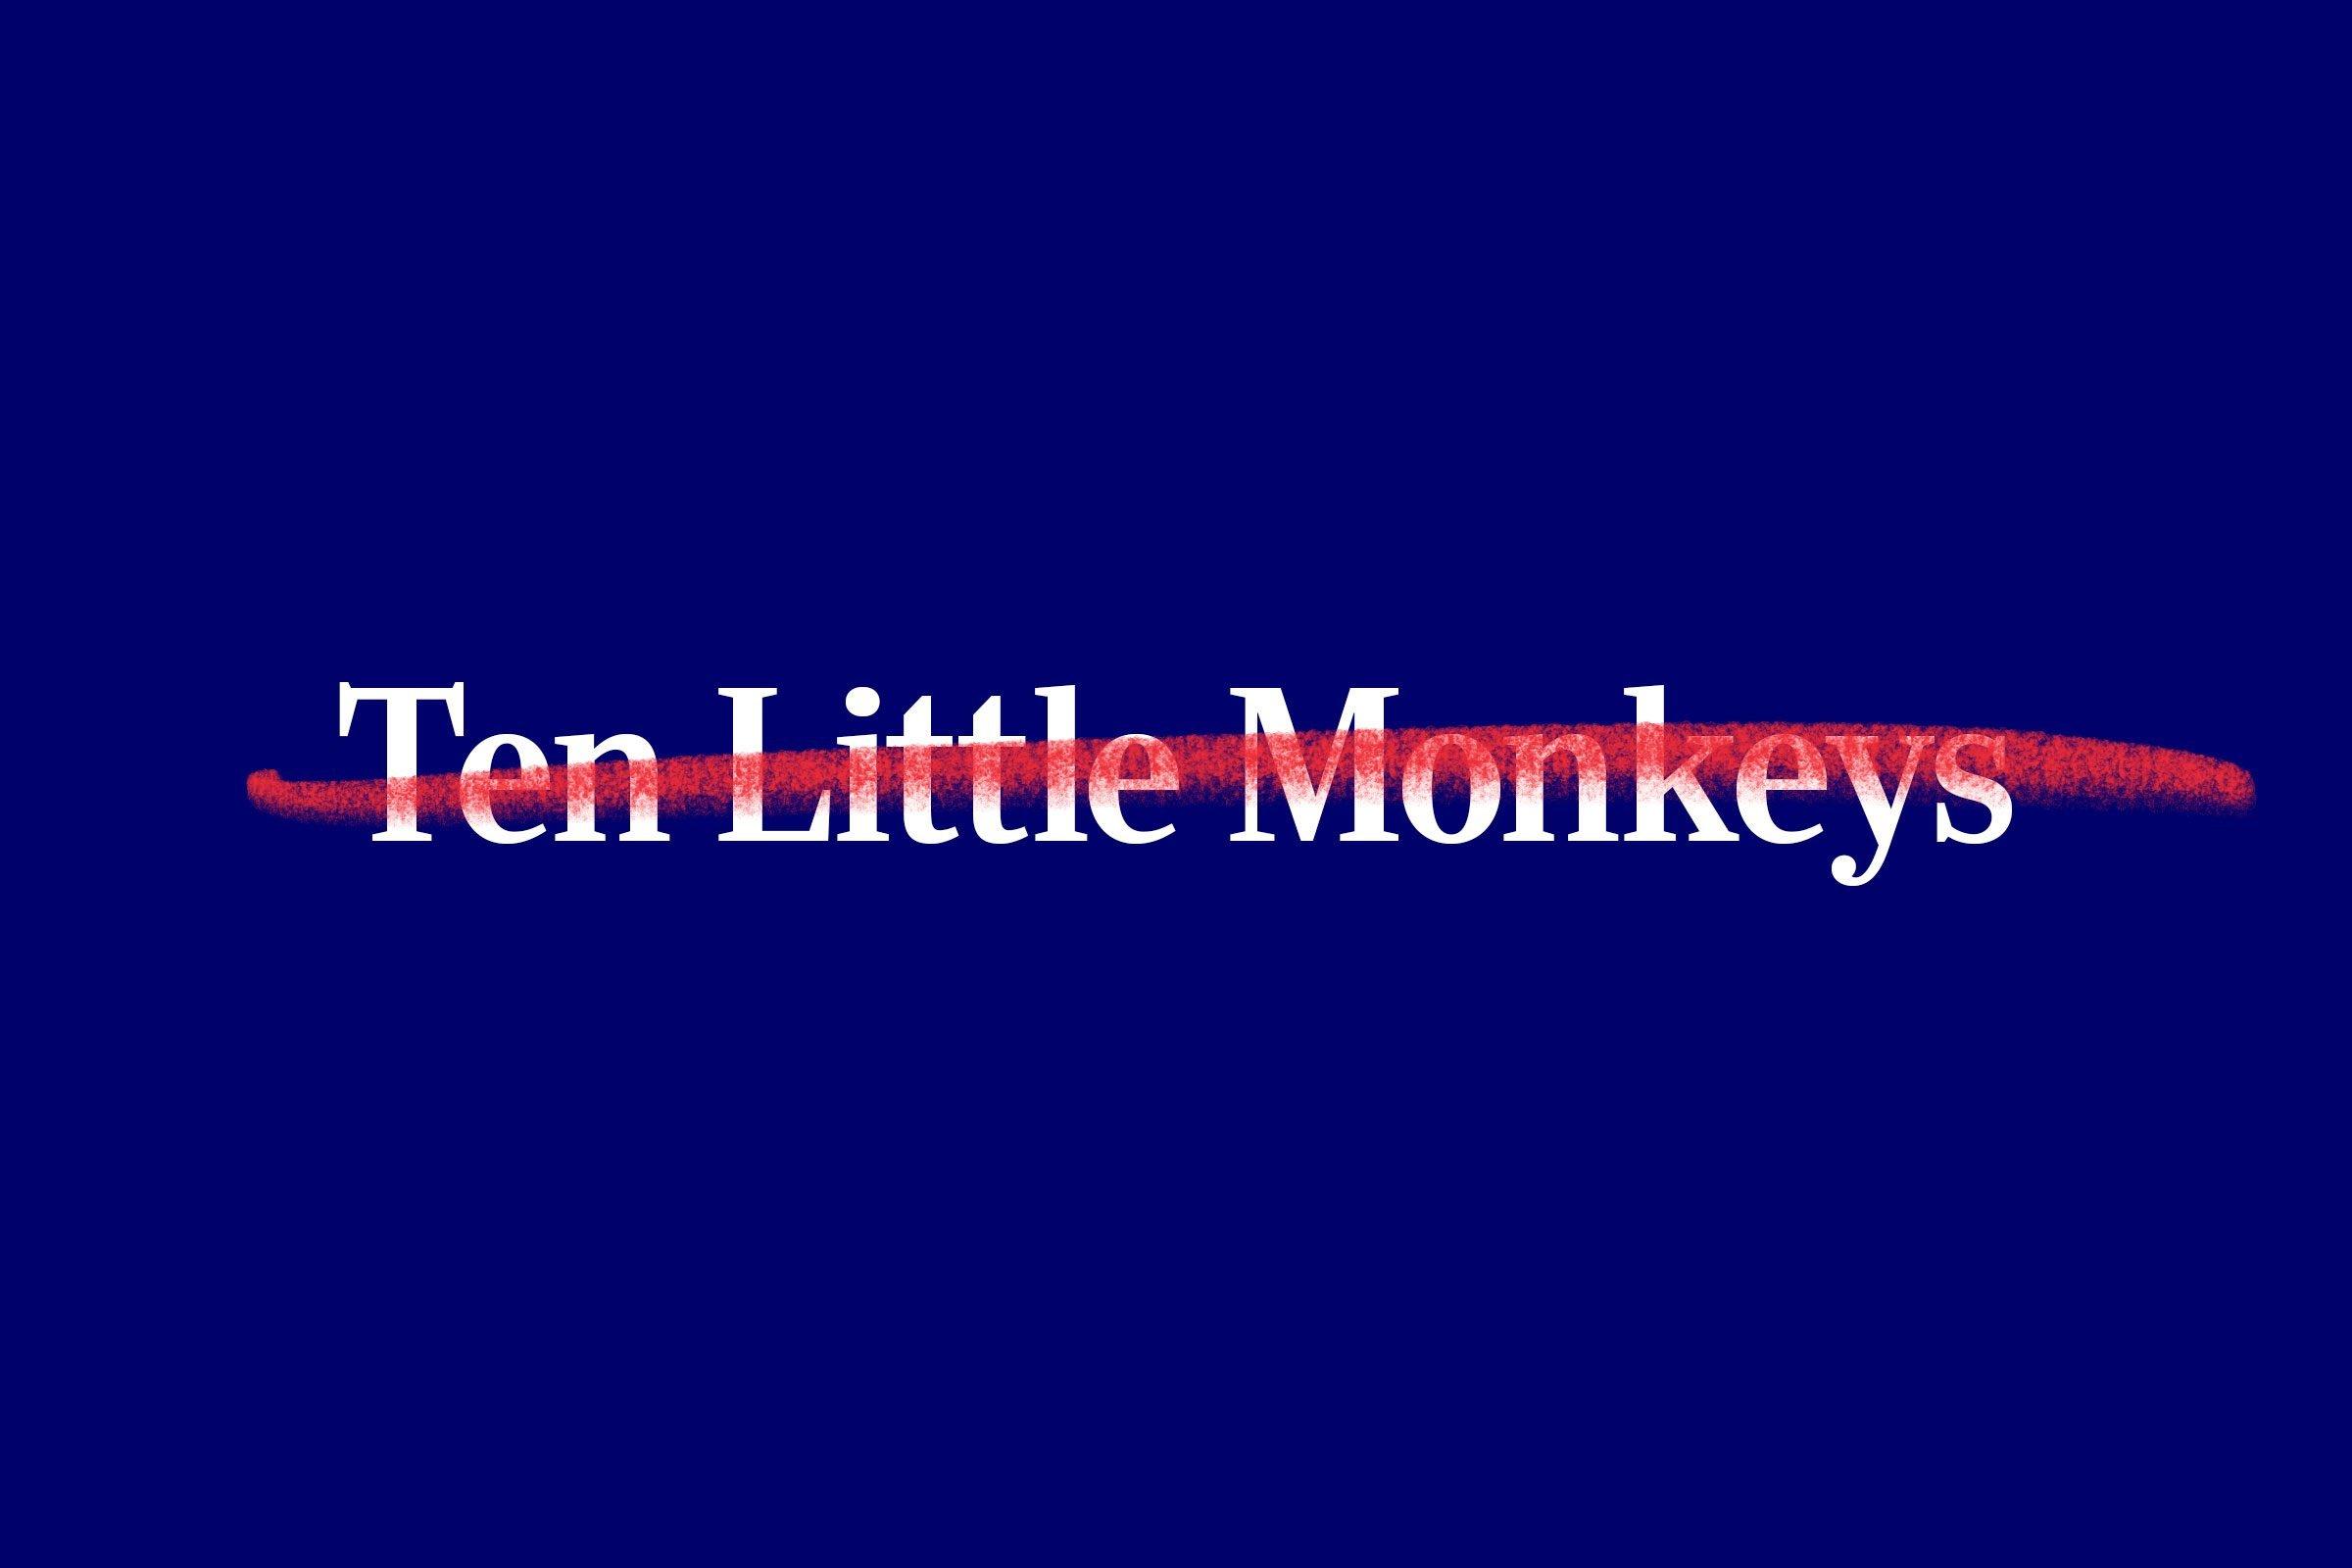 nursery rhyme title (Ten Little Monkeys) with red strikethrough overlay